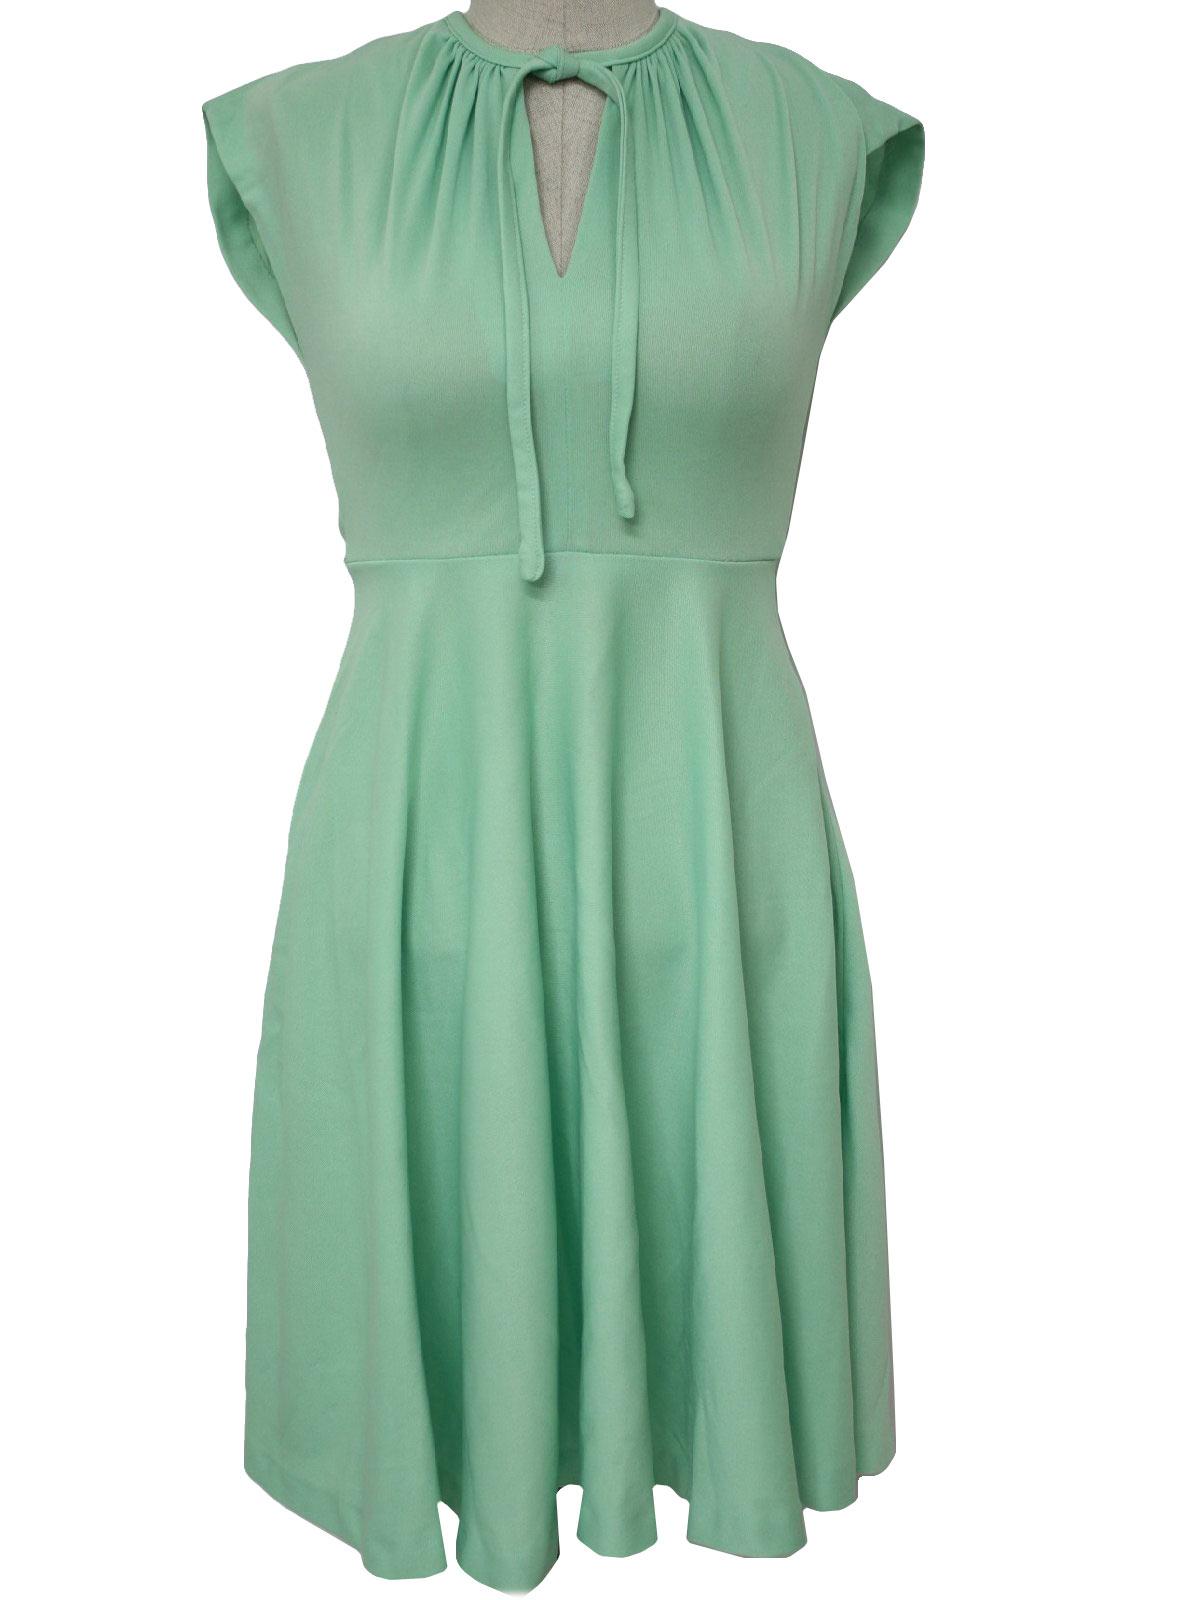 Formal Dresses Sears - Formal Dresses